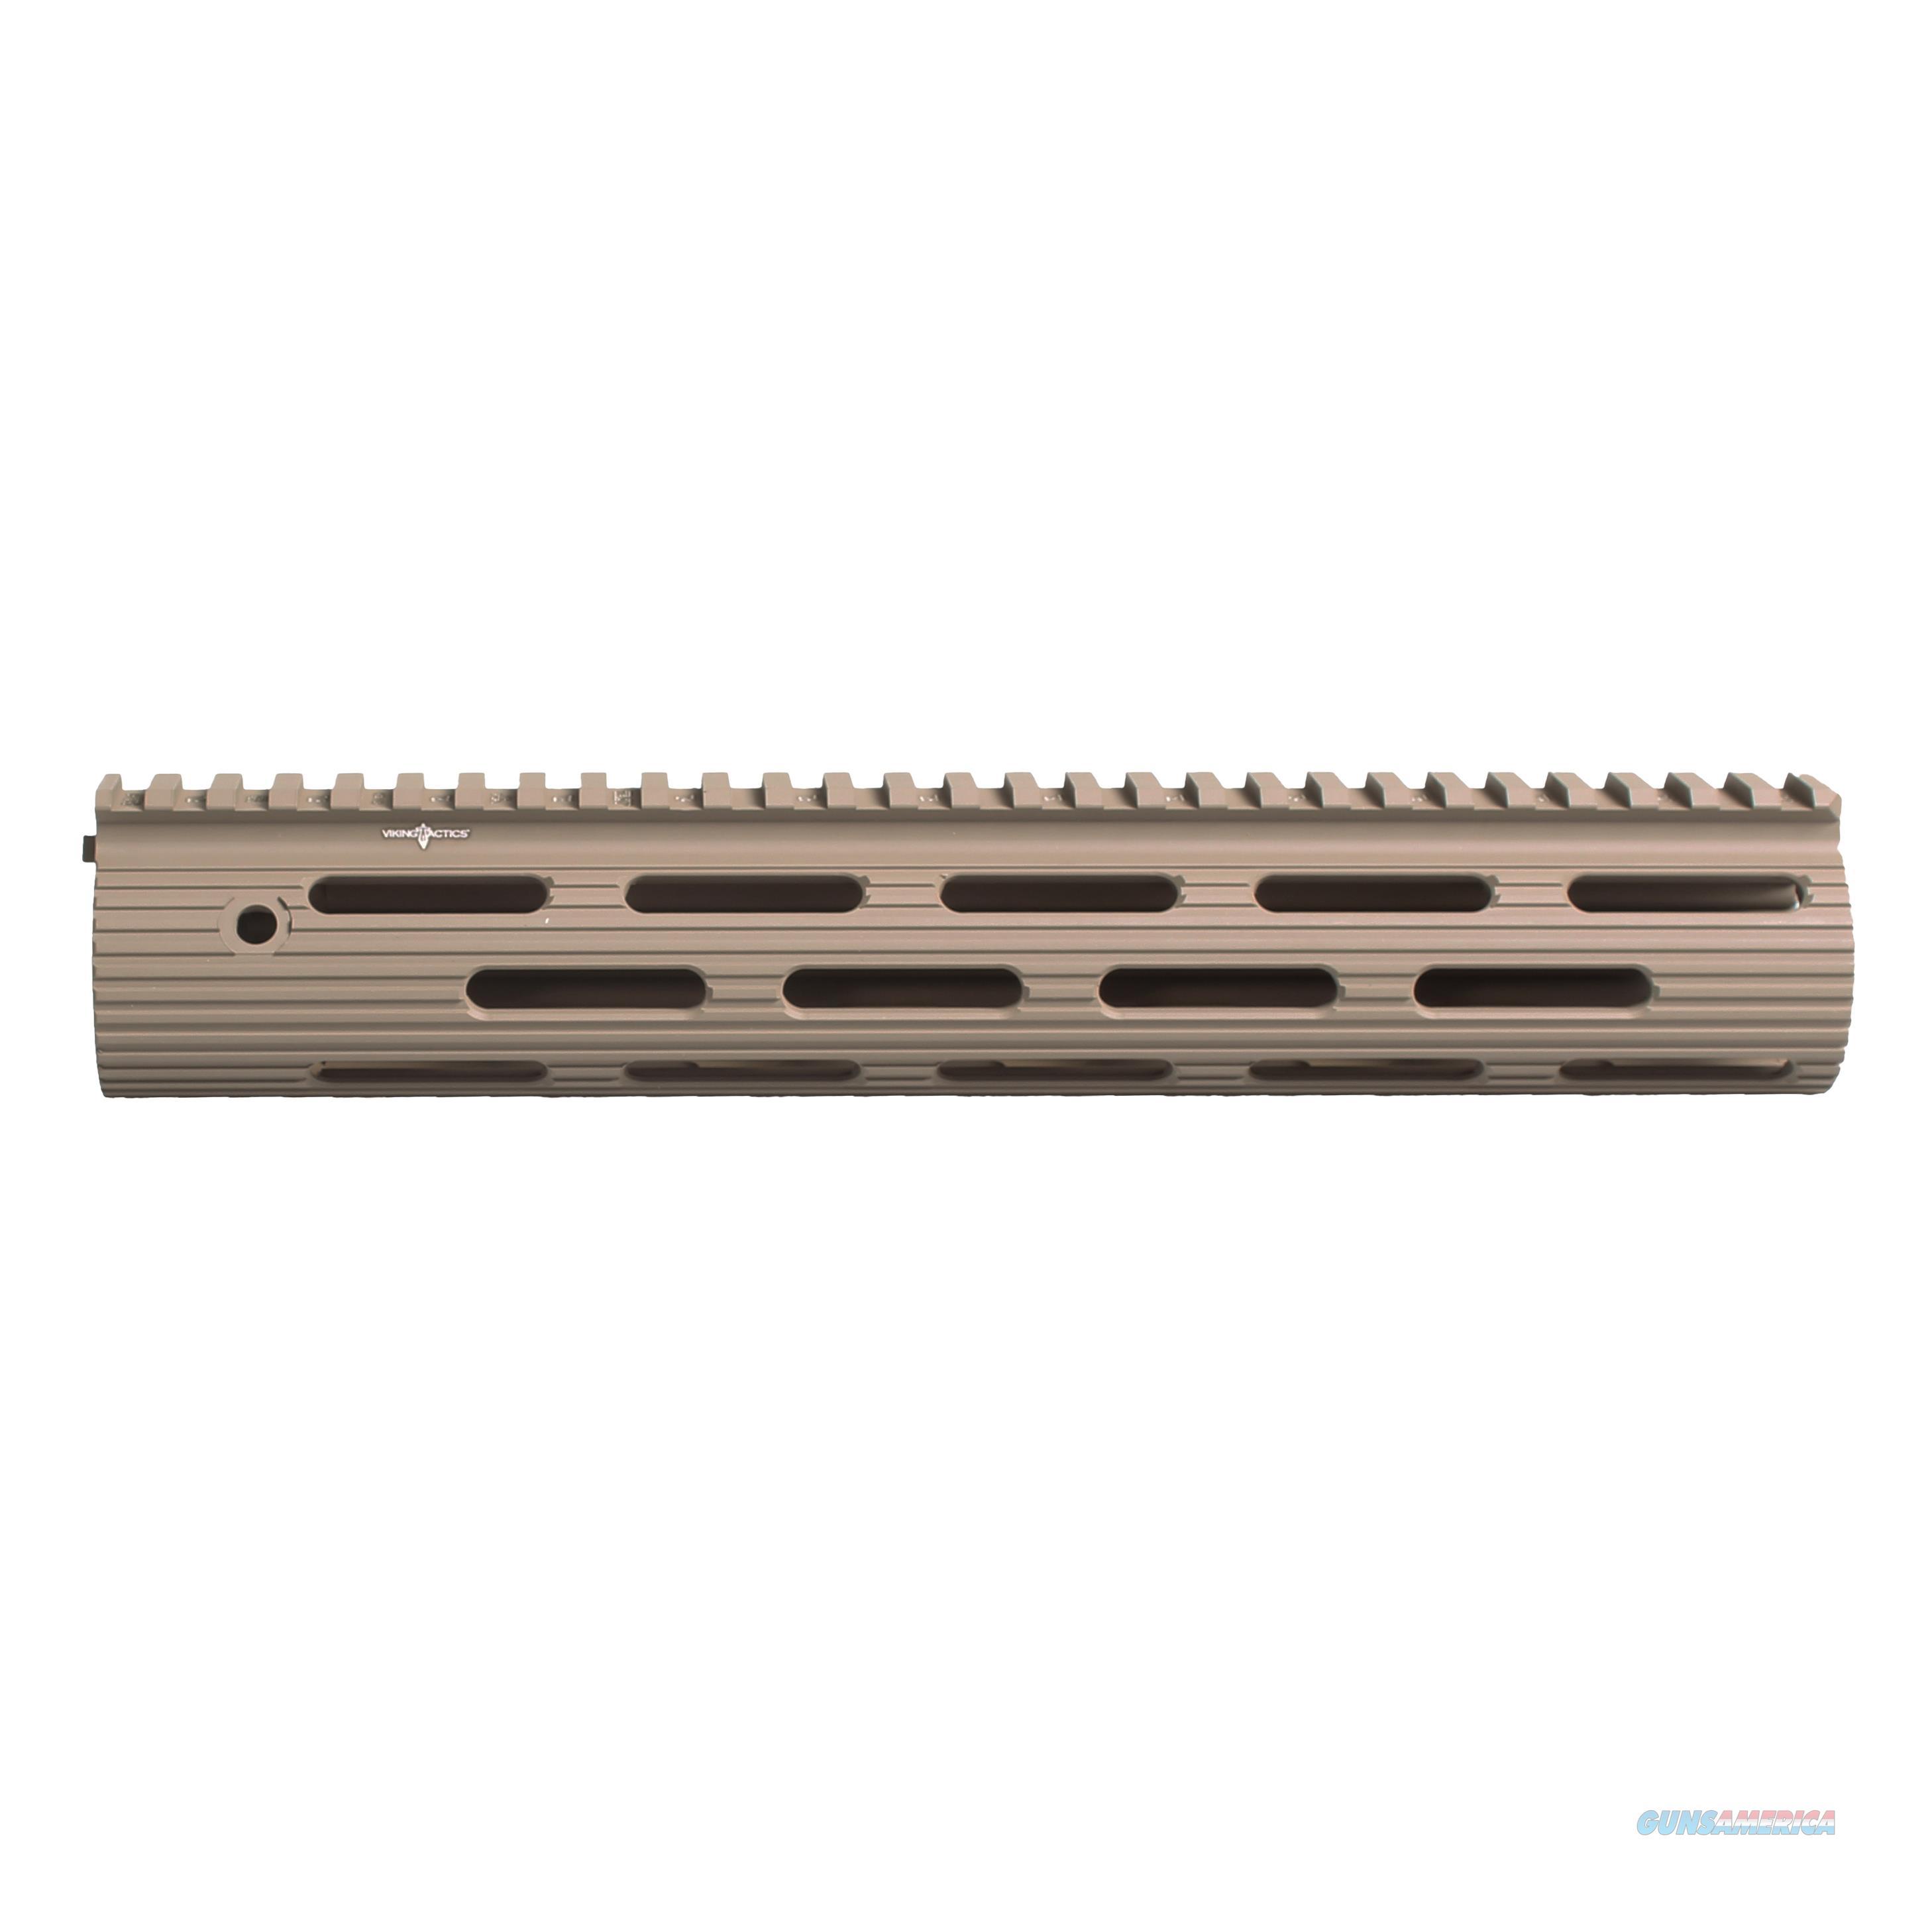 Troy Industries Inc Vtac Alpha Rail, No Sight, Flat Dark Earth STRX-AVK-11FT-01  Non-Guns > Gunstocks, Grips & Wood